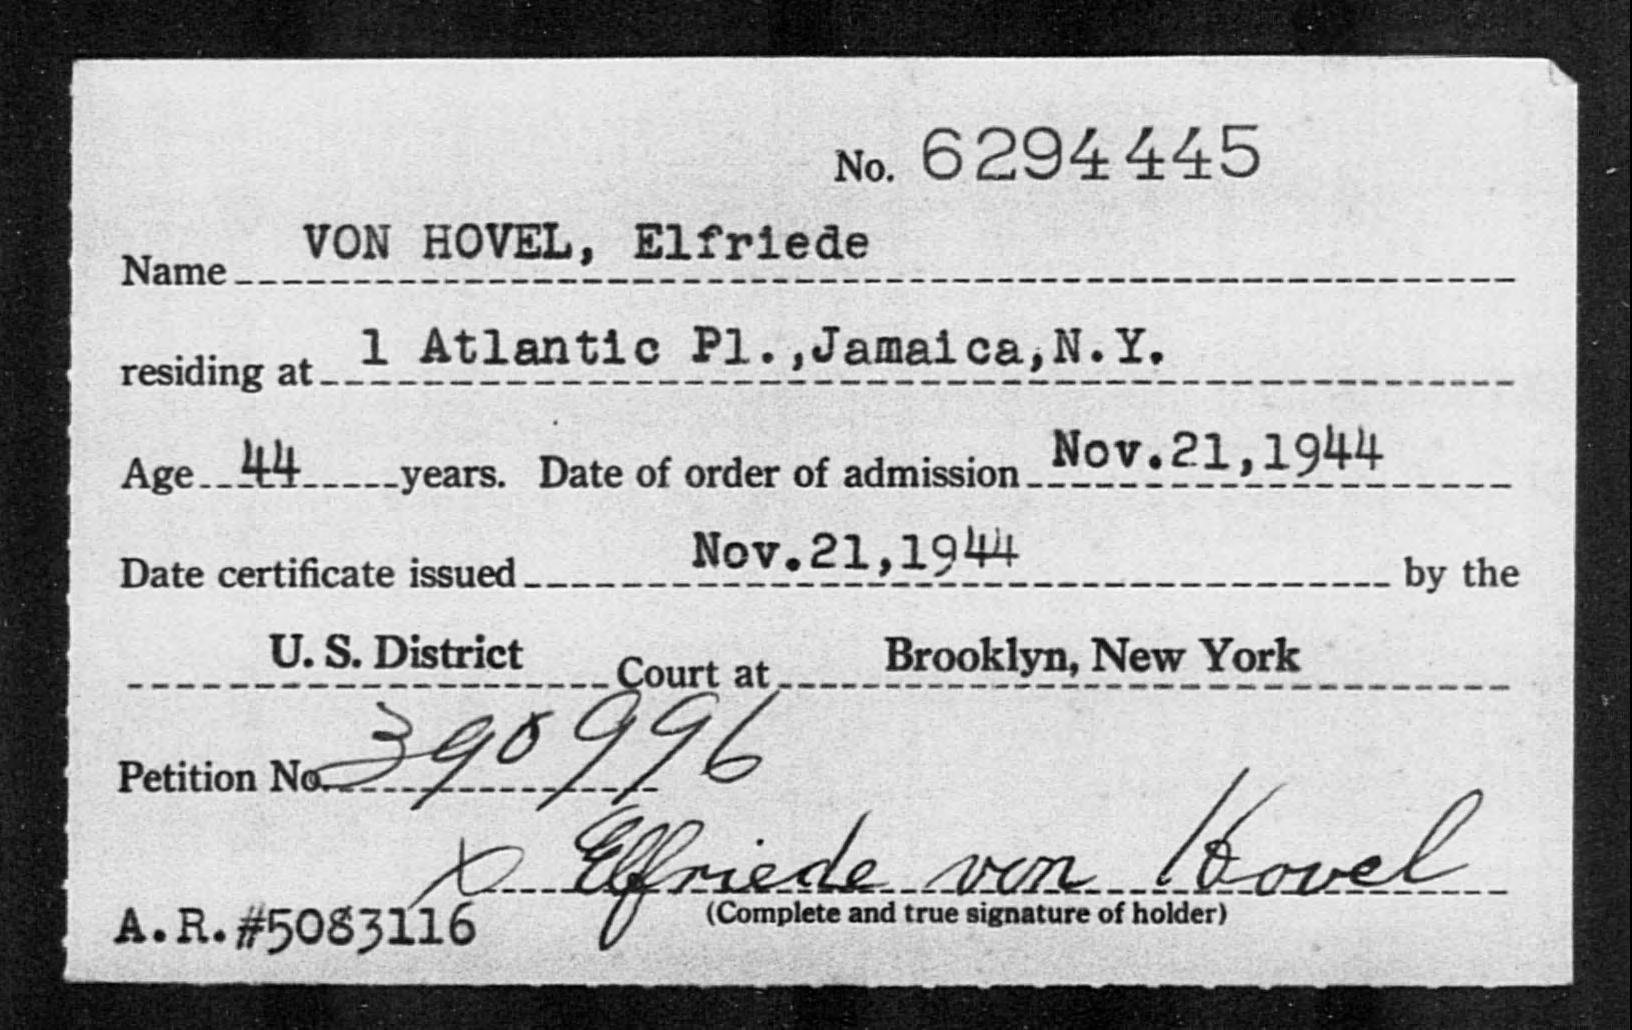 VON HOVEL, Elfriede - Born: [BLANK], Naturalized: 1944